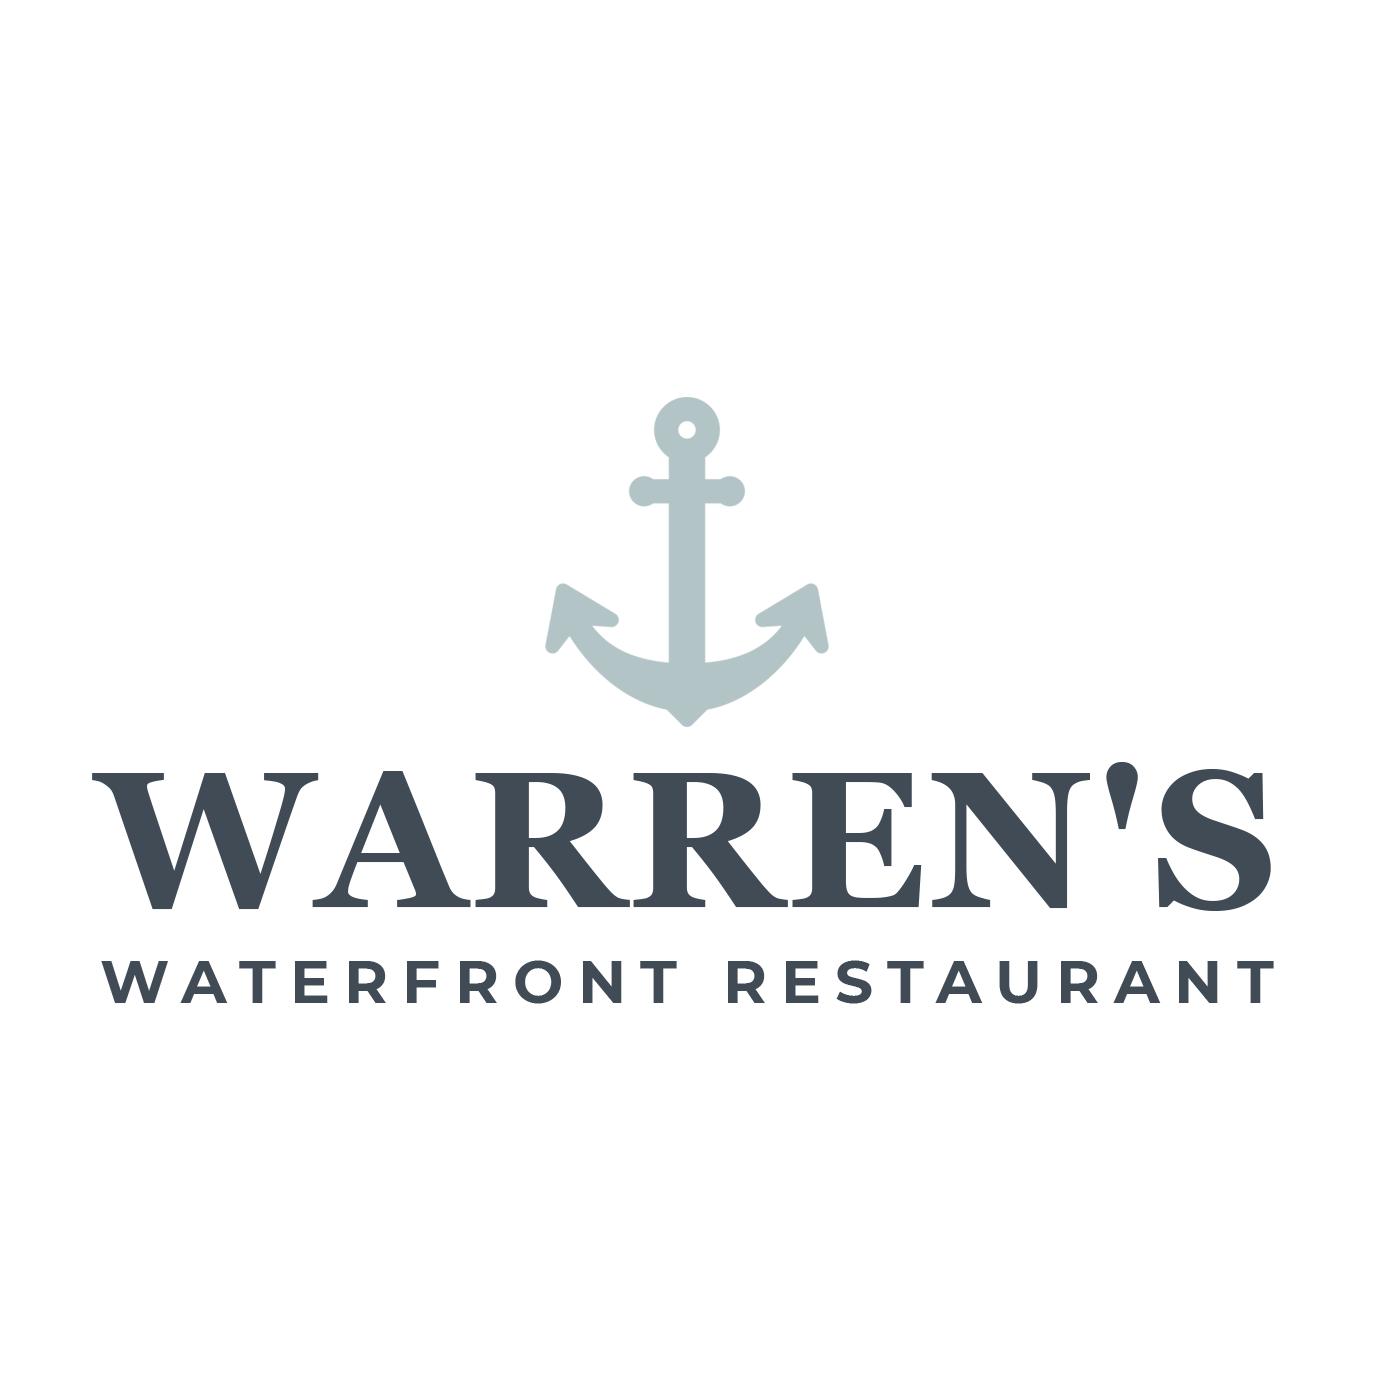 Warren's Waterfront Restaurant